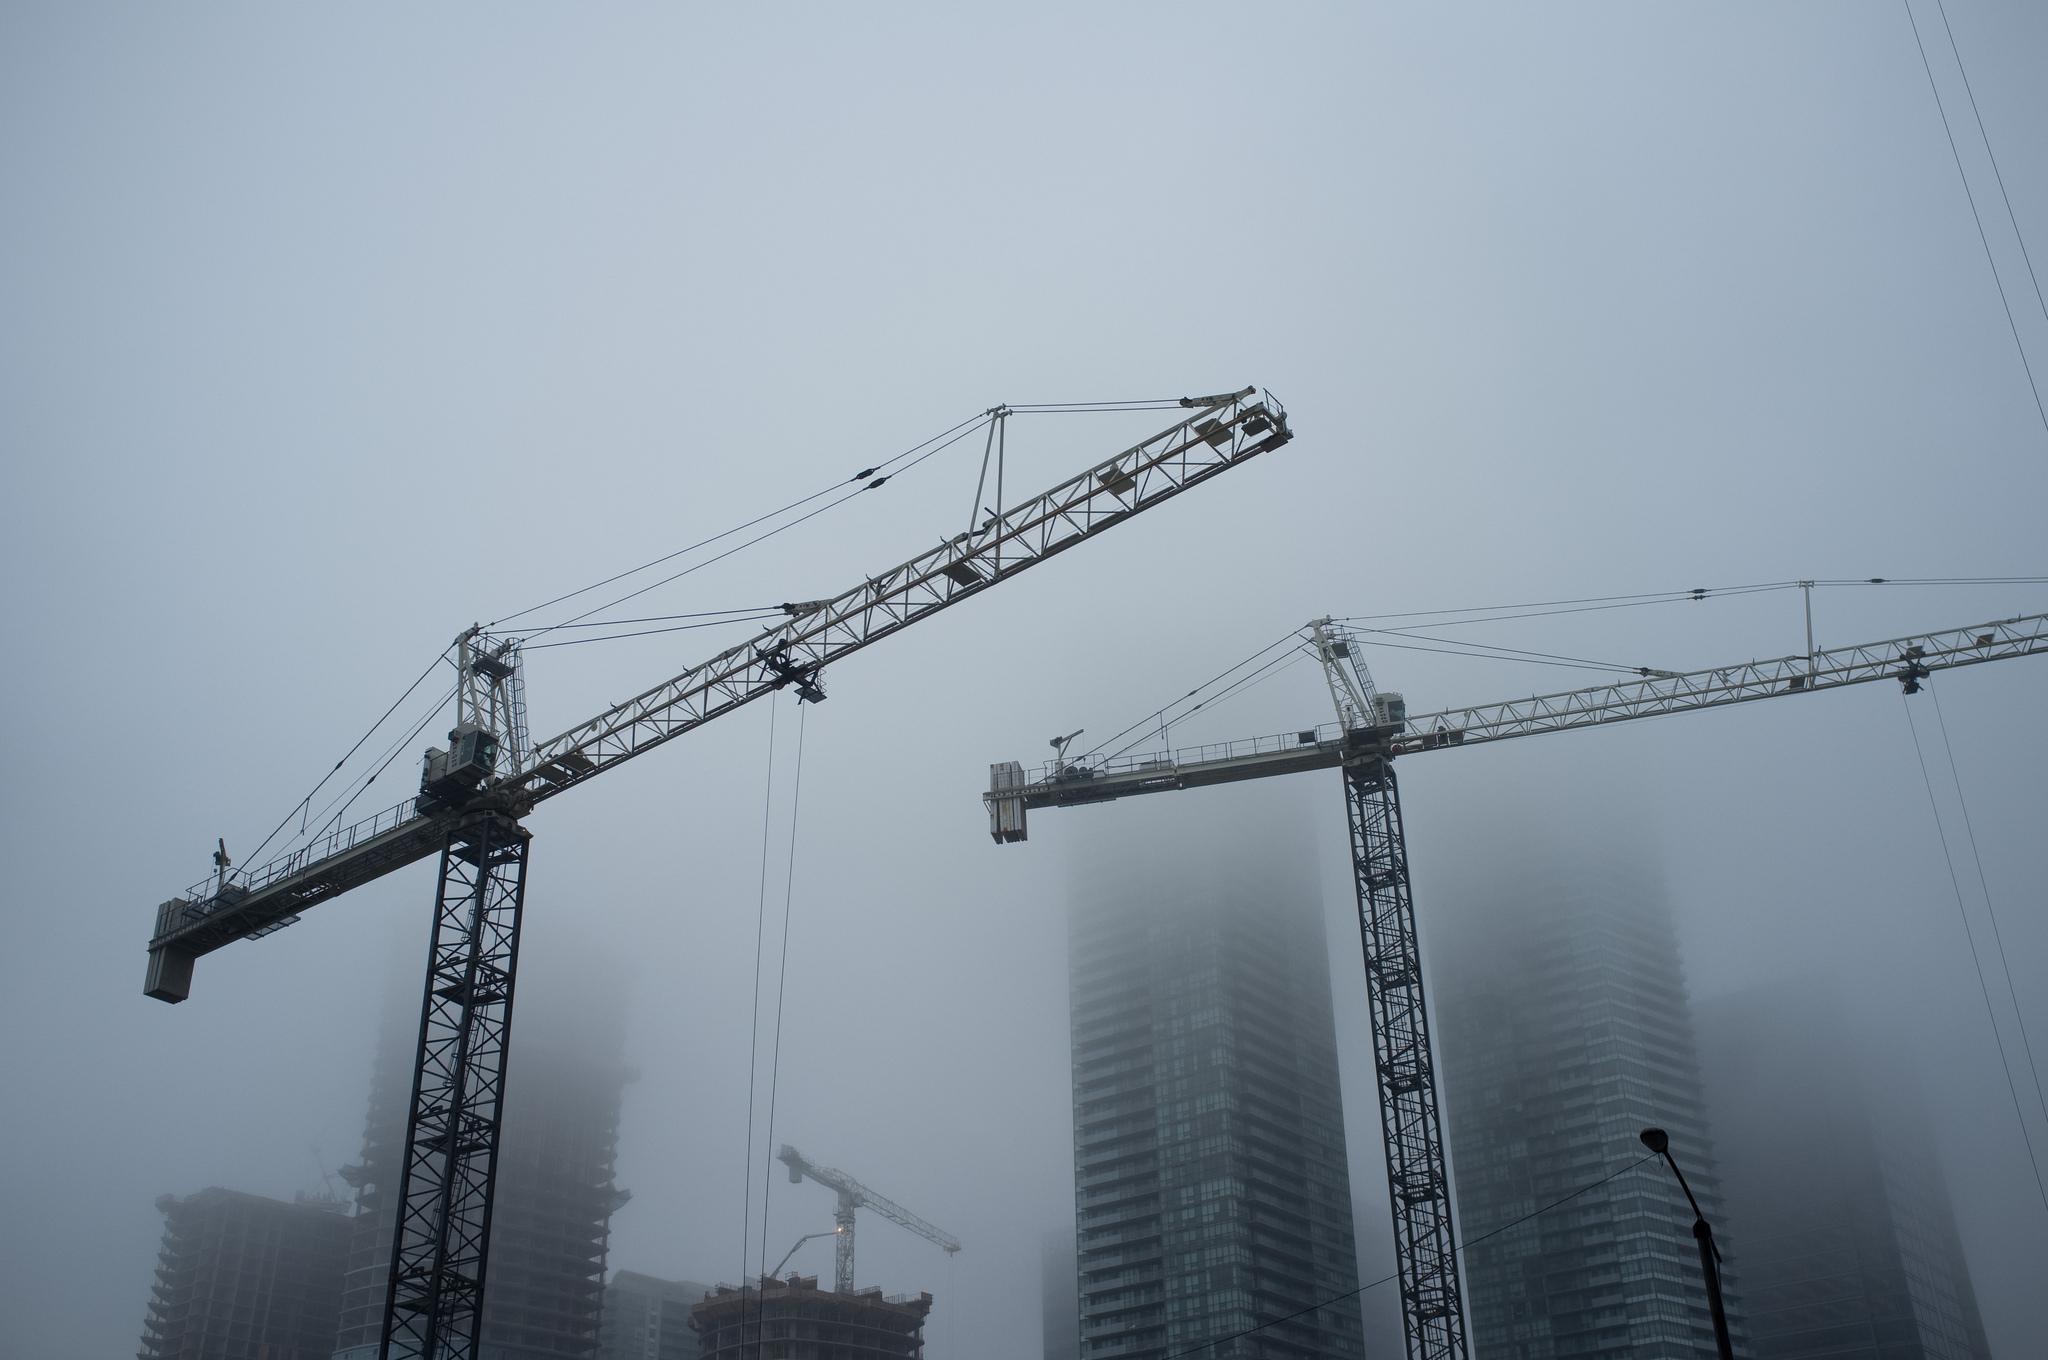 Construction Season by Richard Minton